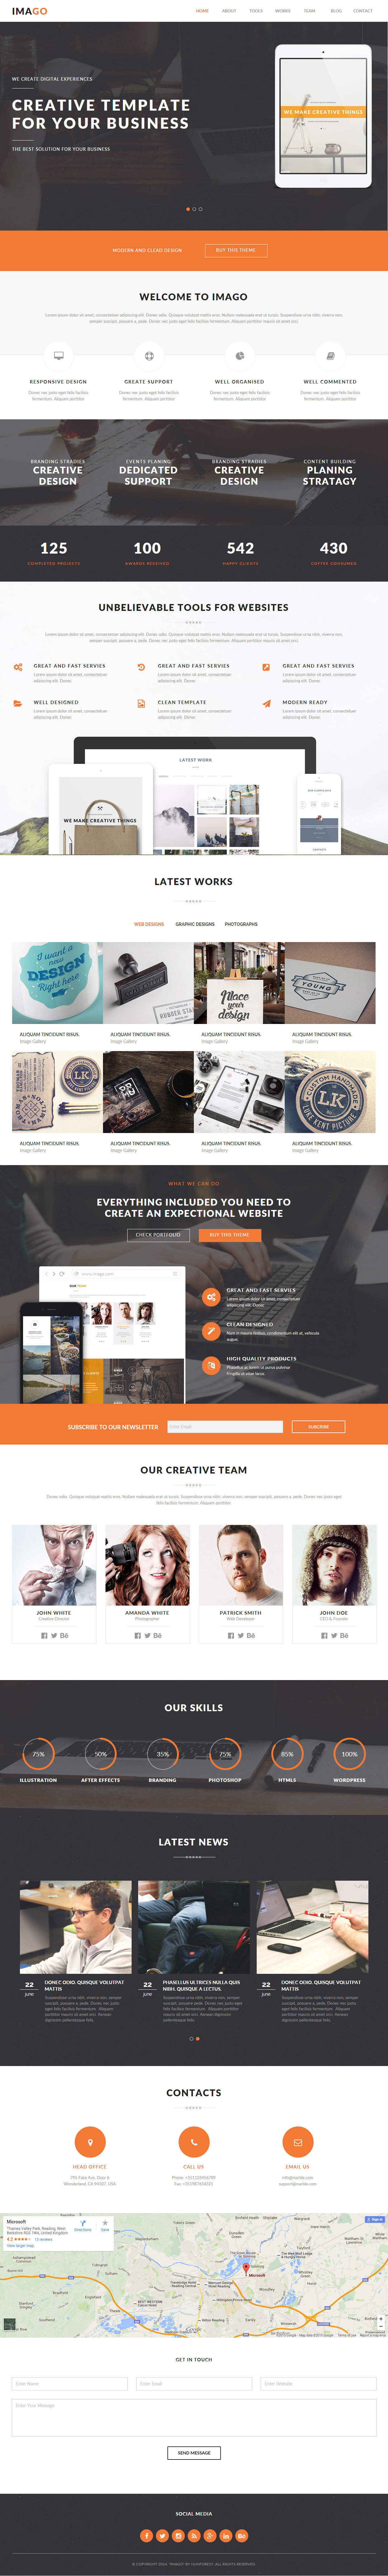 Imago - Premium Responsive Multipurpose Muse Template | Template and ...